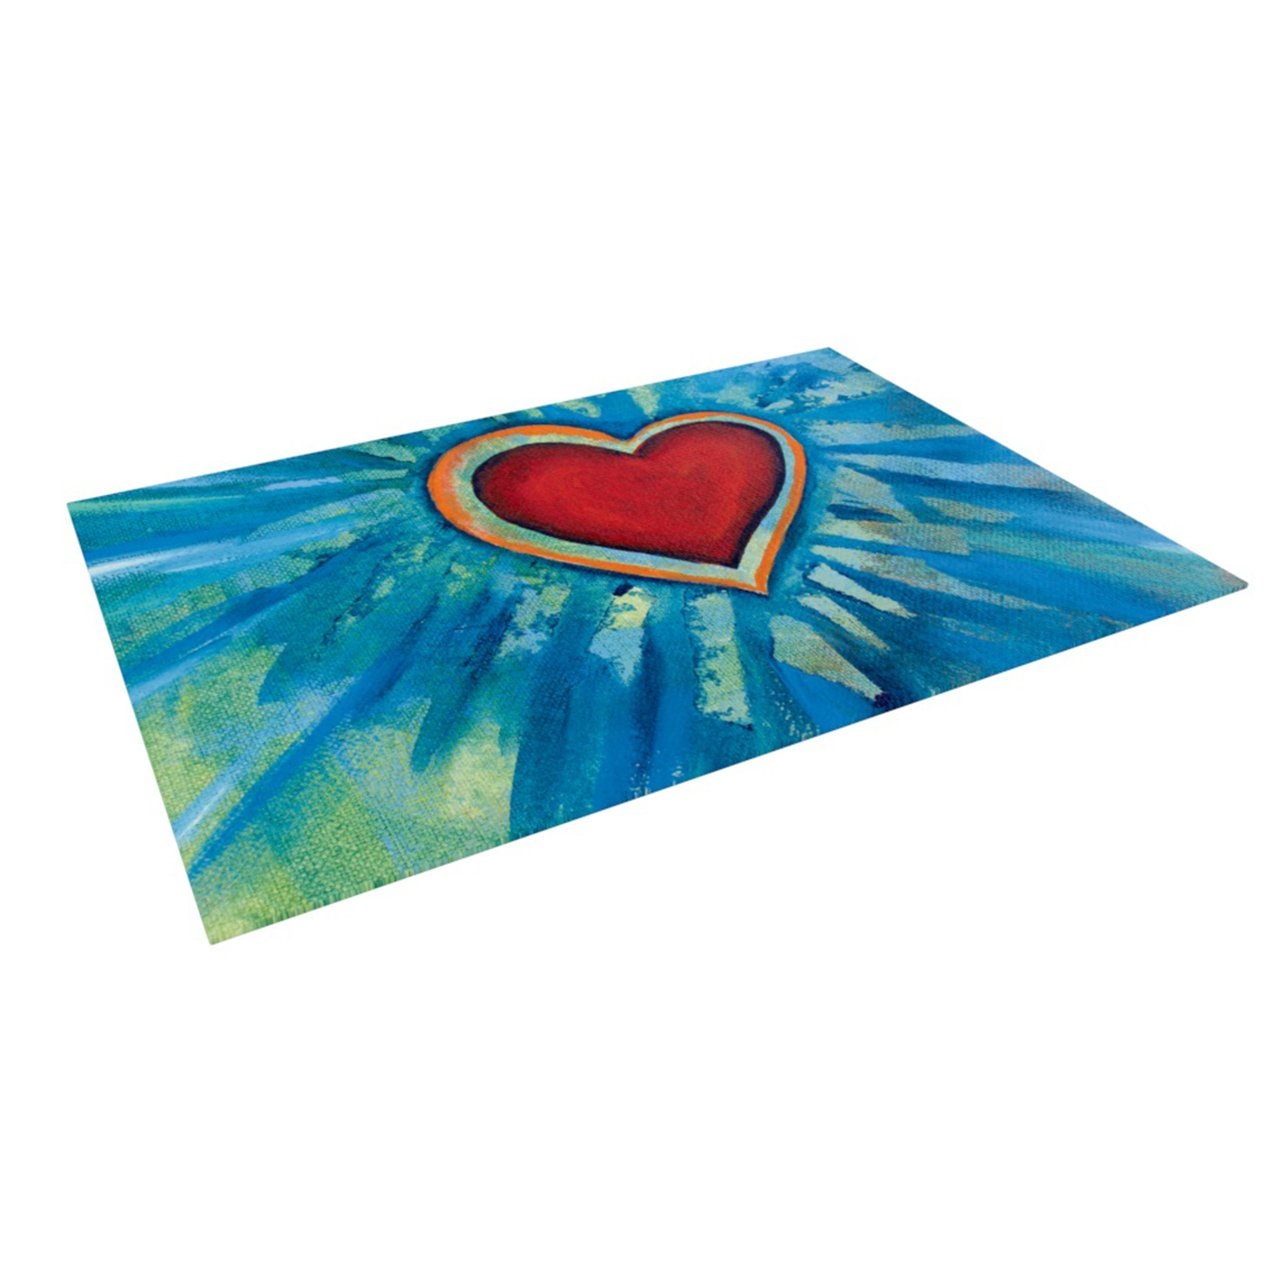 Kess InHouse Padgett Mason ''Love Shines On'' Indoor/Outdoor Floor Mat, 4-Feet by 5-Feet